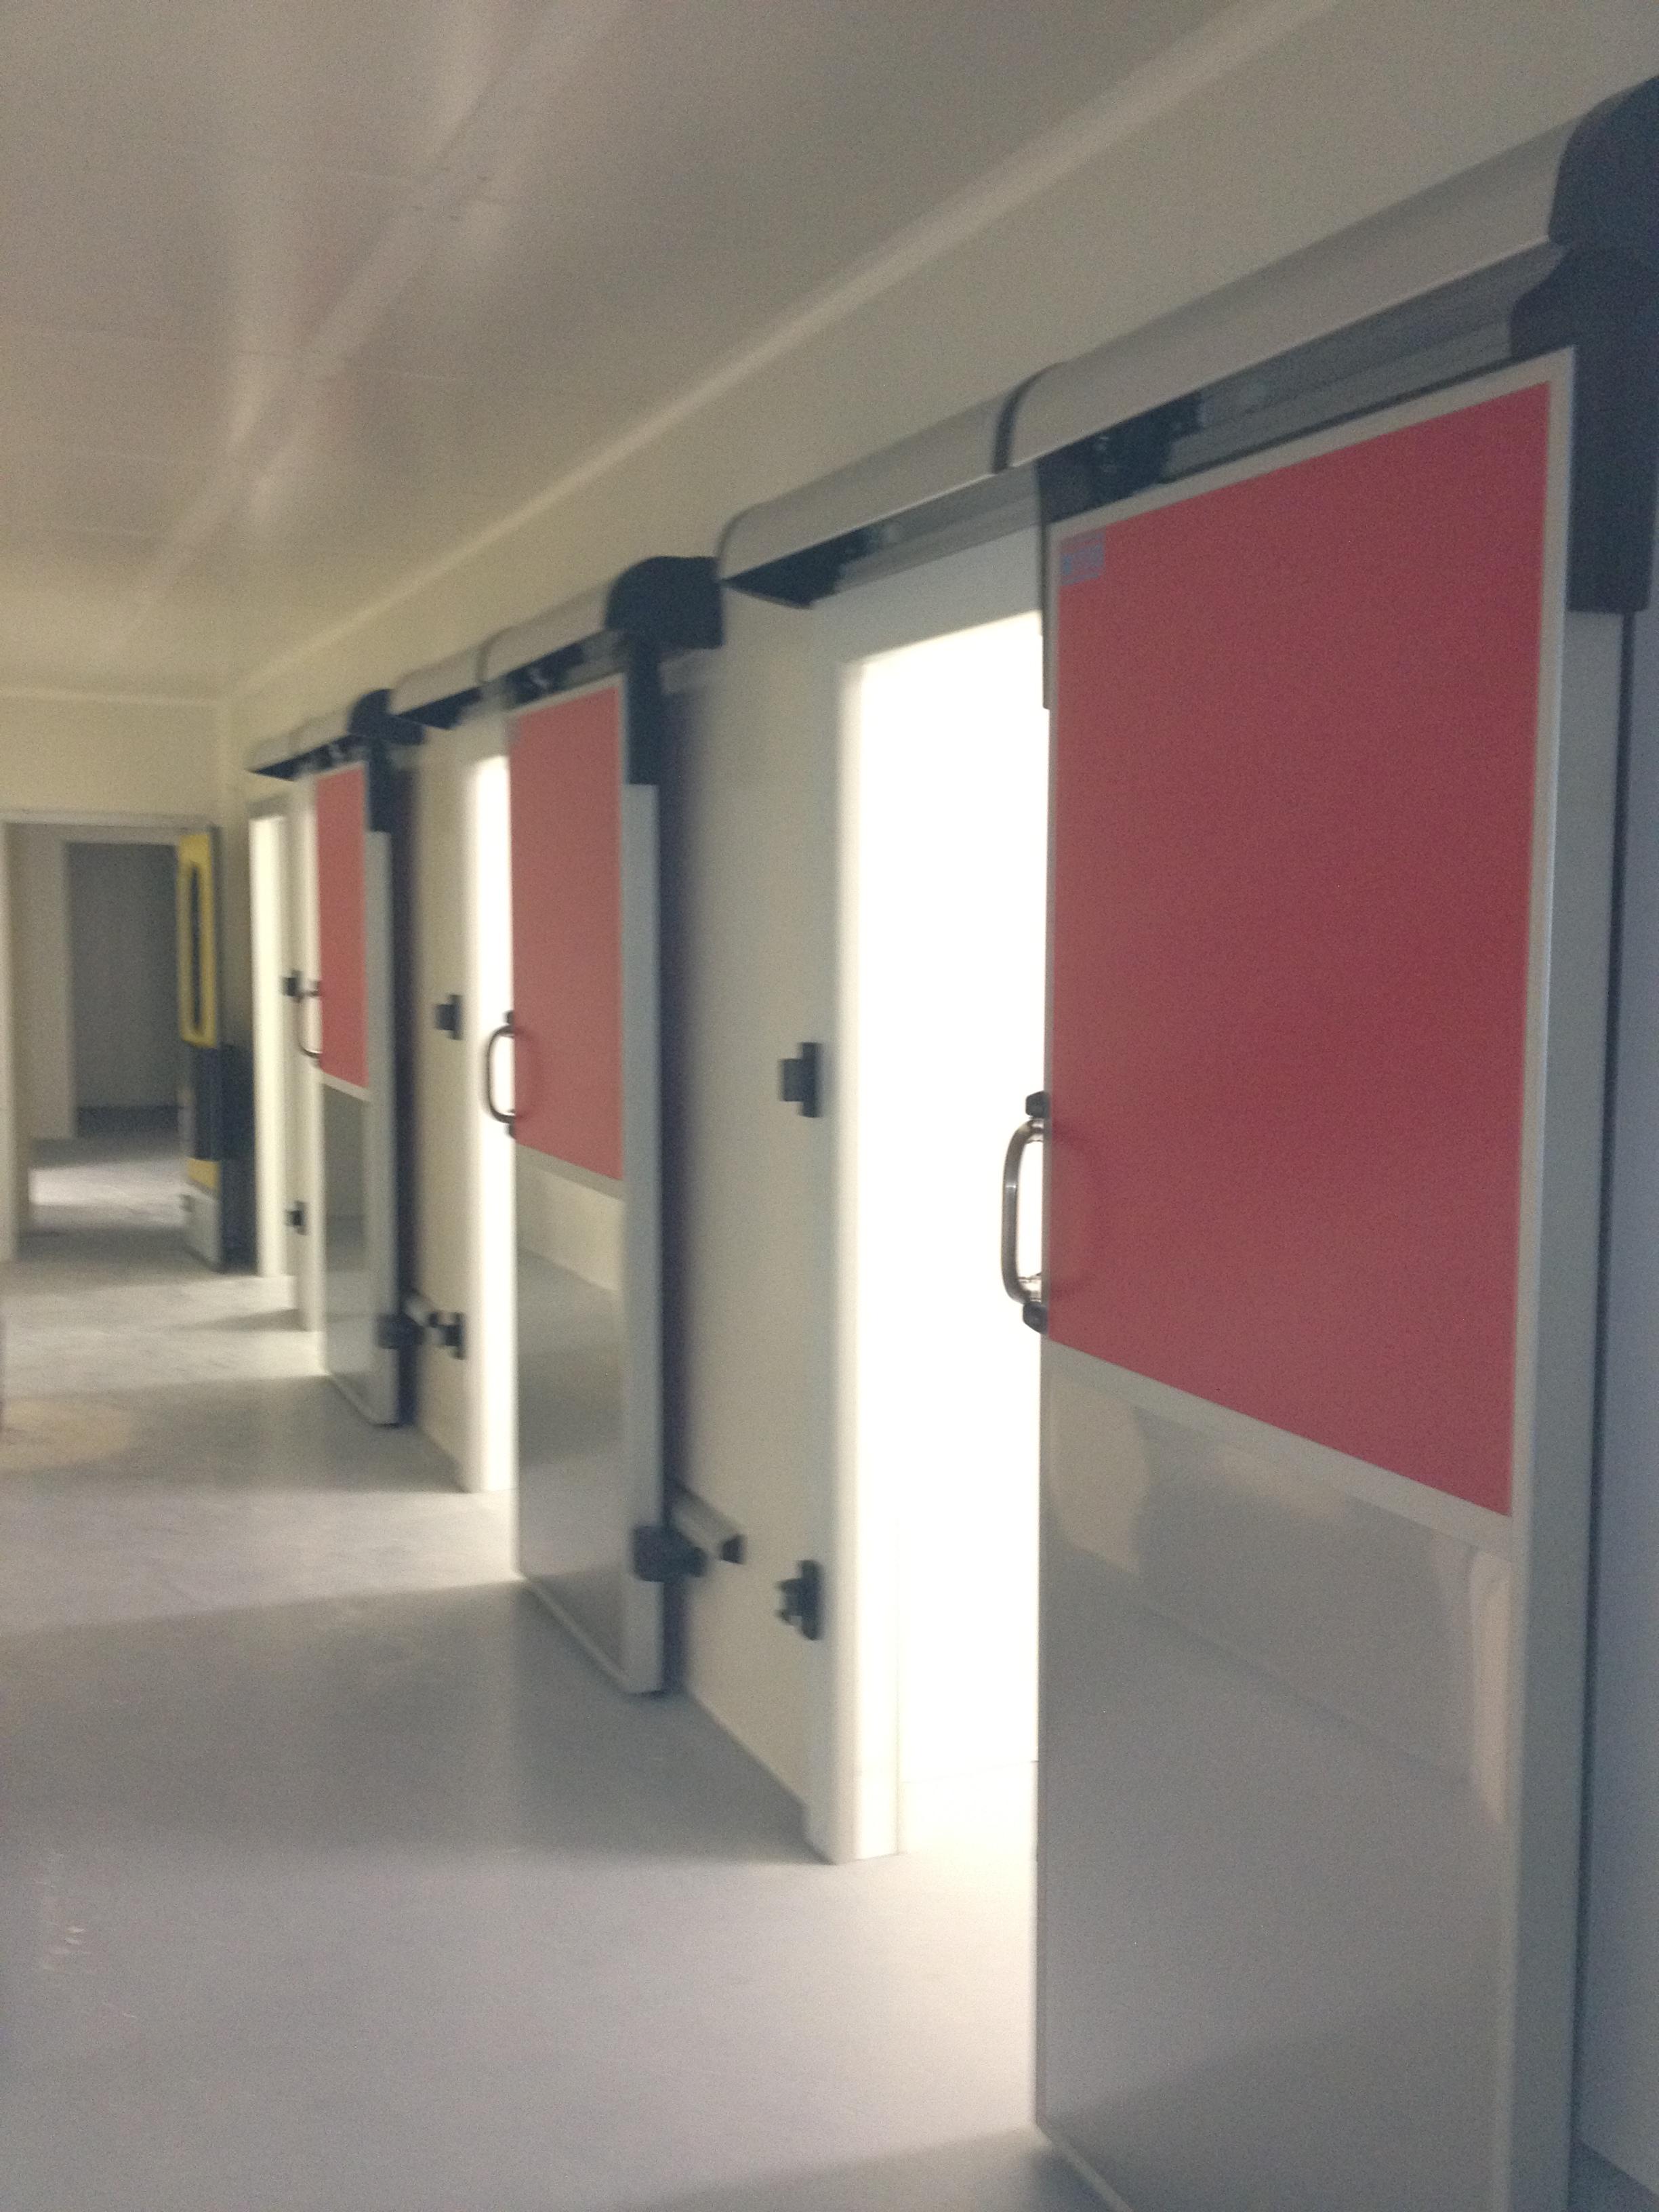 panneaux isothermes chambres froides if39isolation frigorifique 39. Black Bedroom Furniture Sets. Home Design Ideas